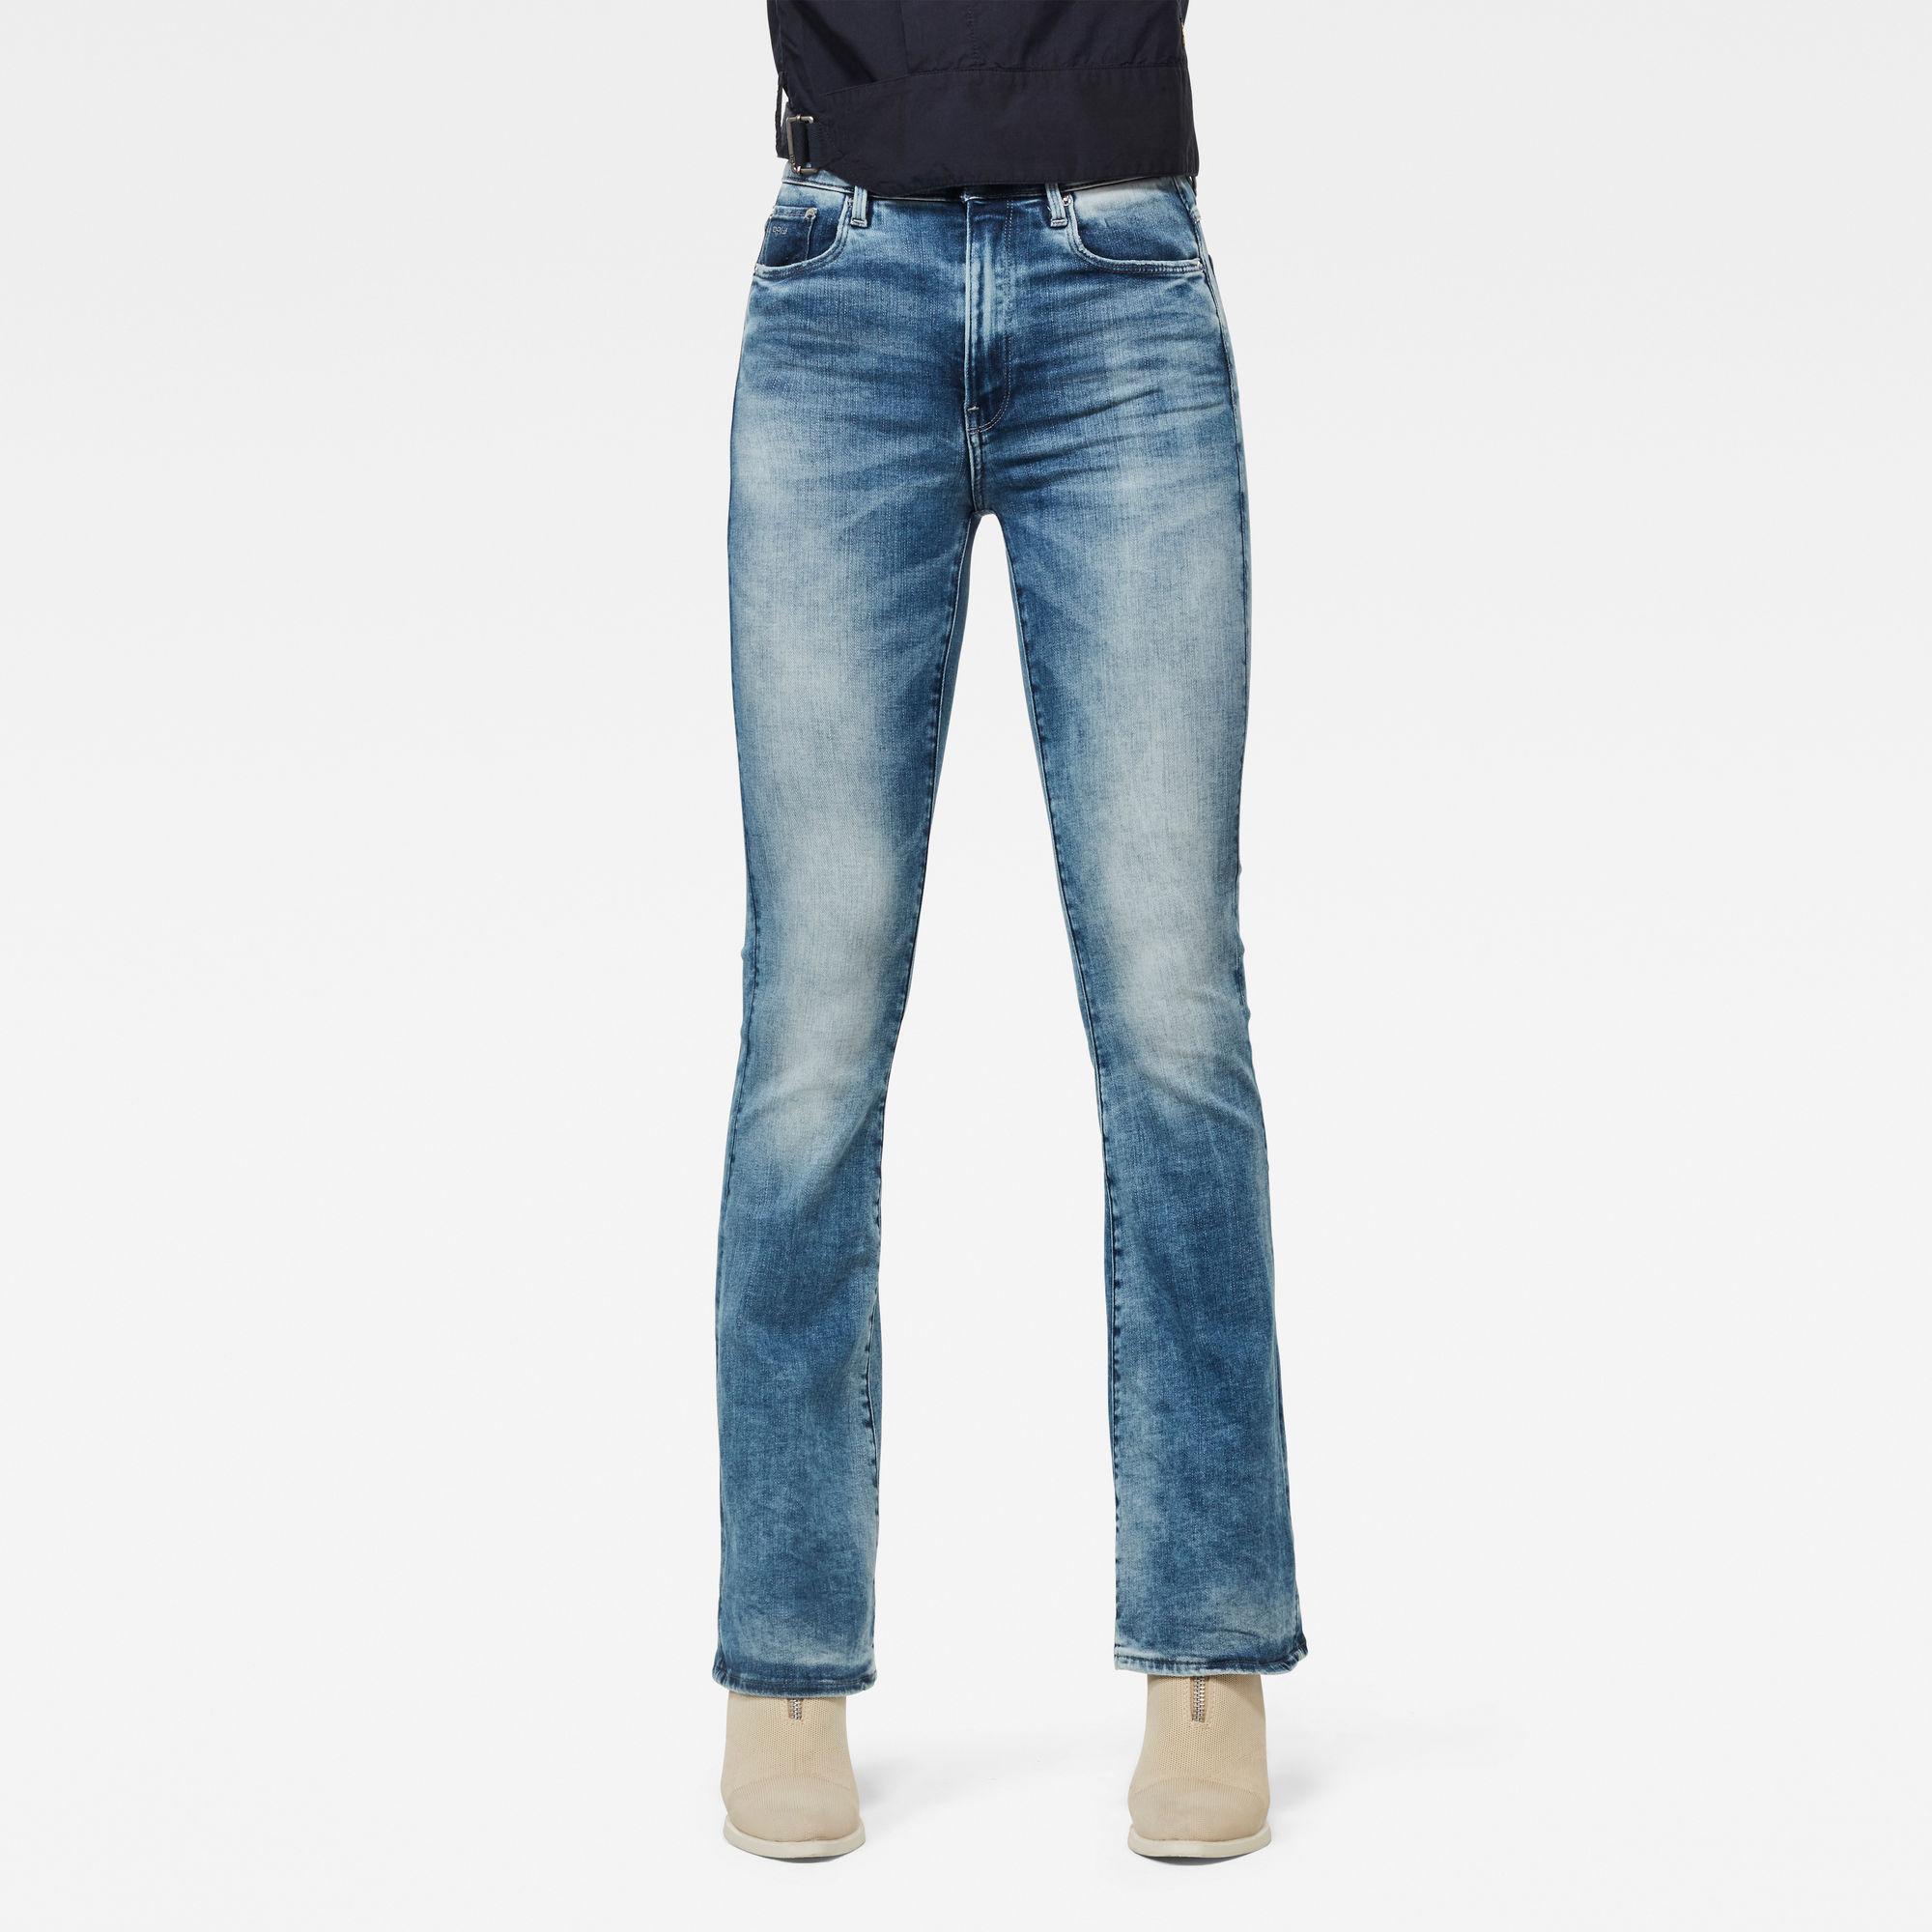 G-Star RAW Dames 3301 High Flare Jeans Lichtblauw